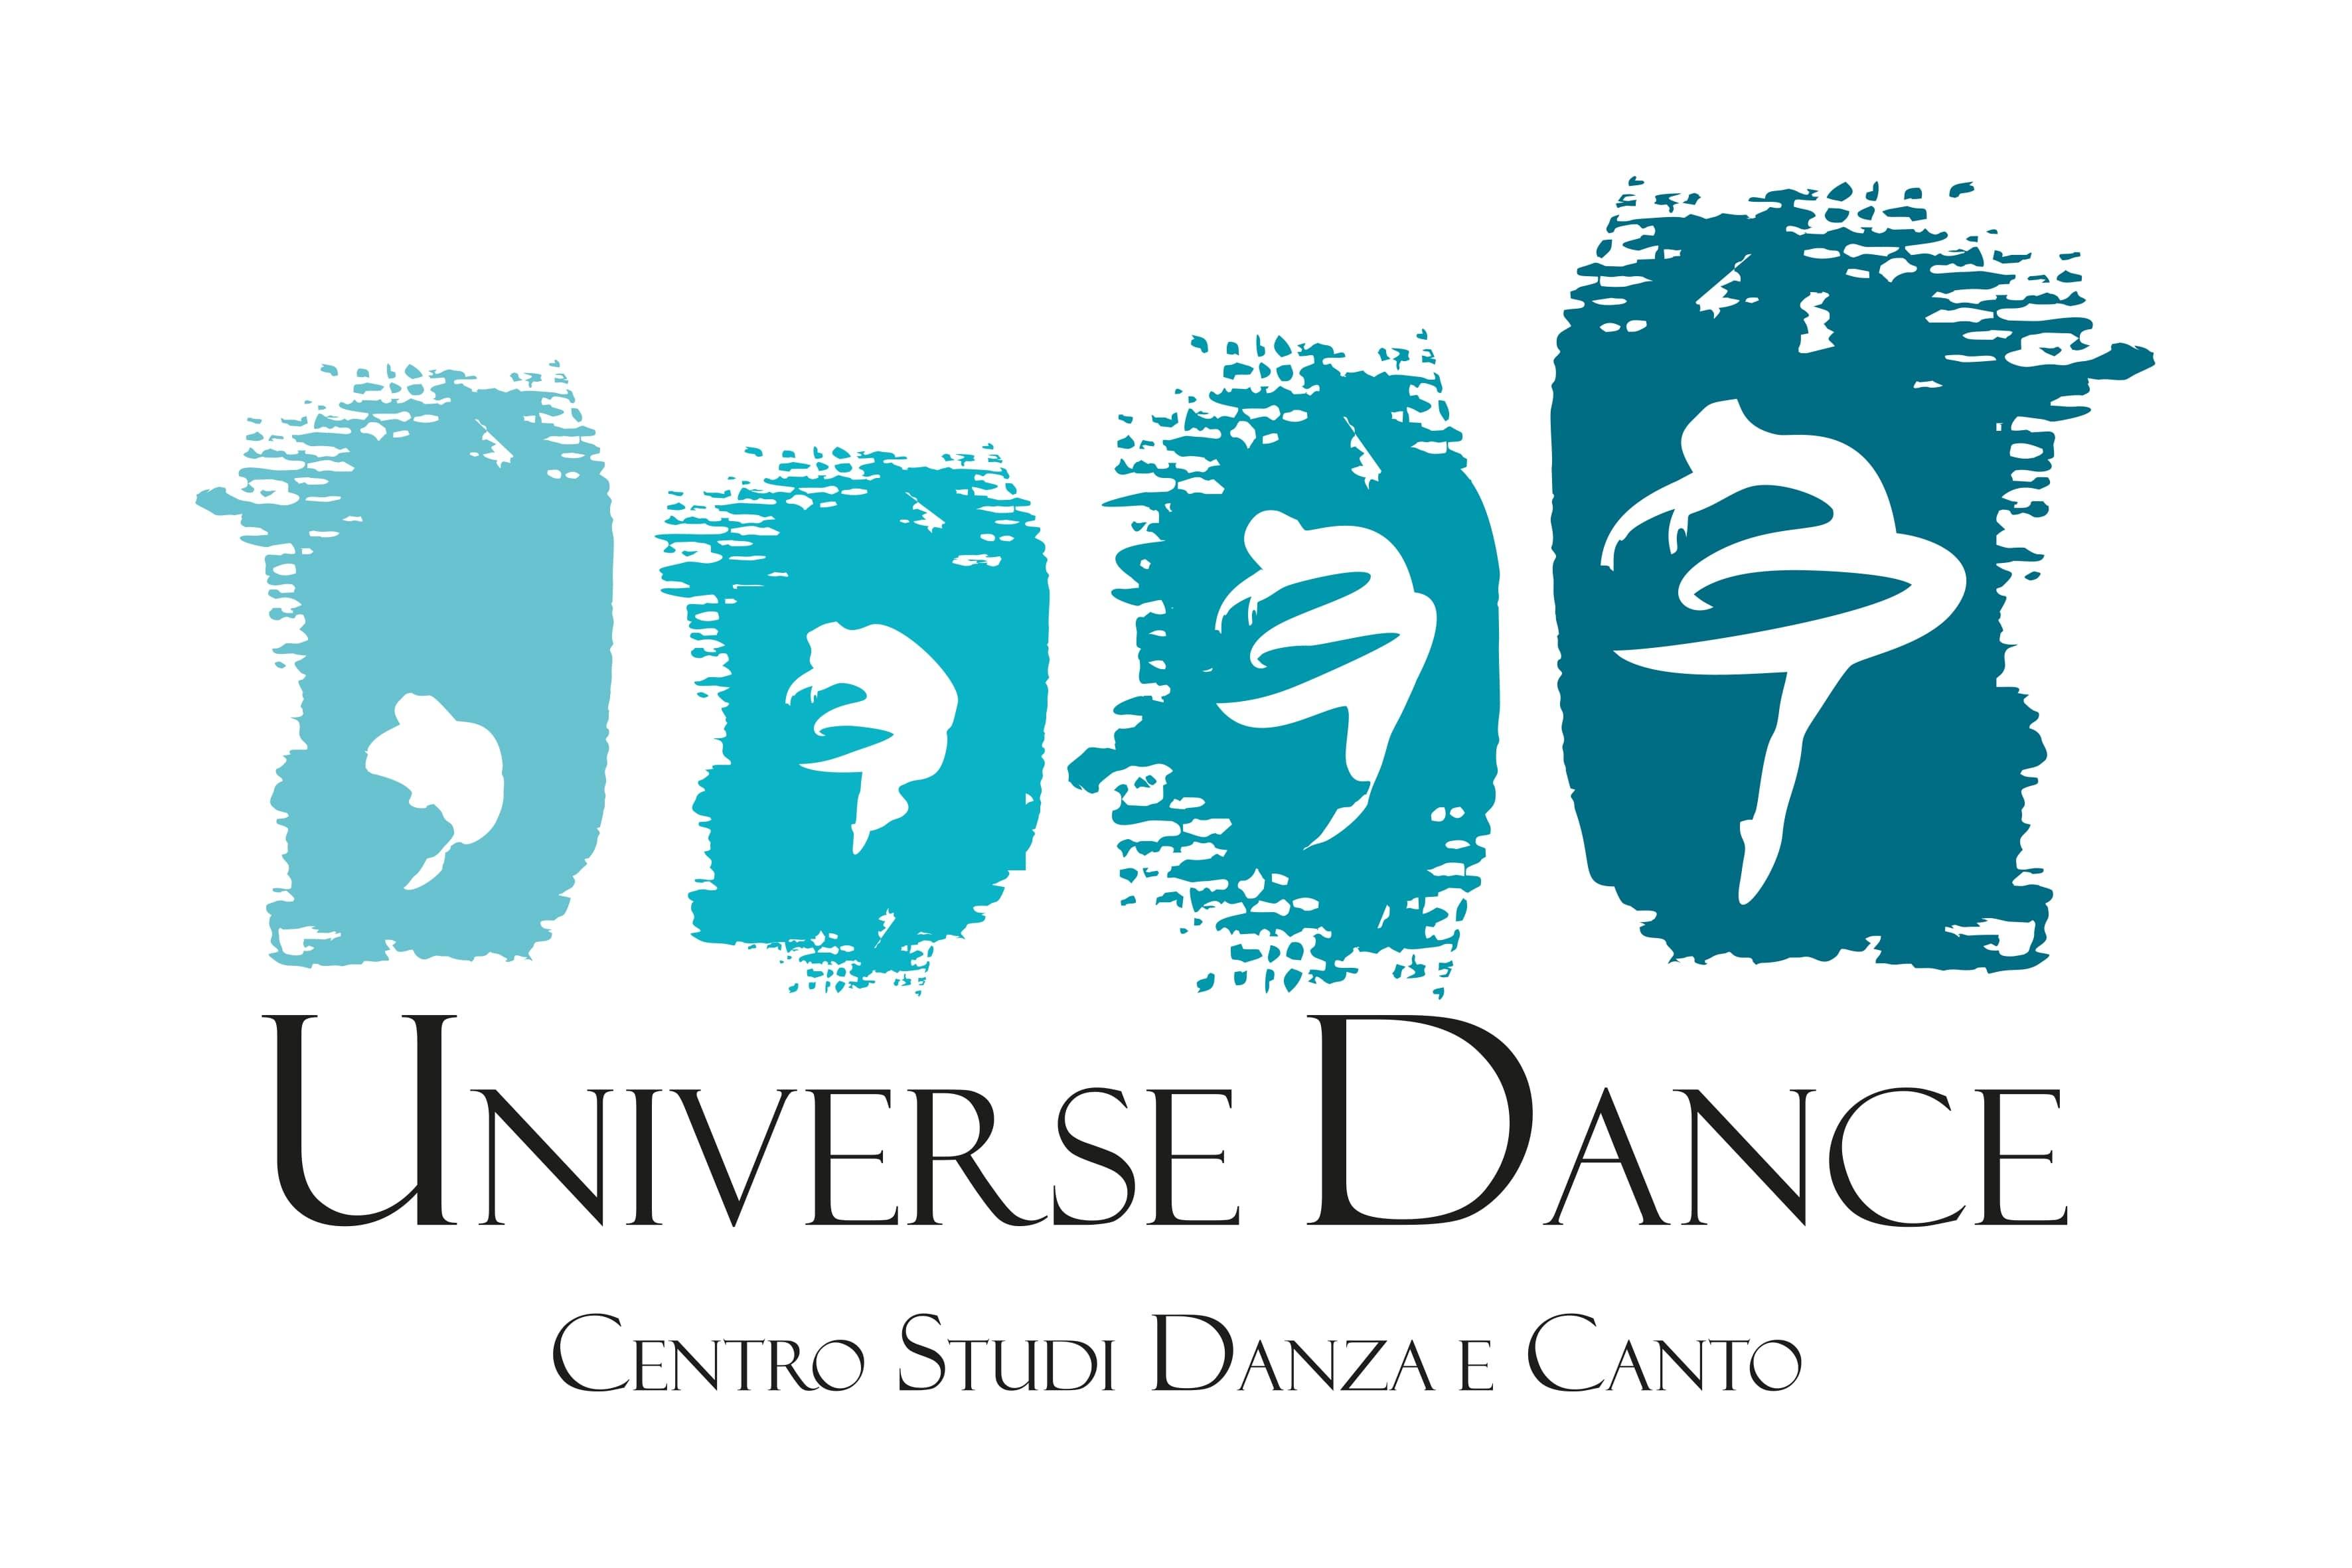 Universe Dance